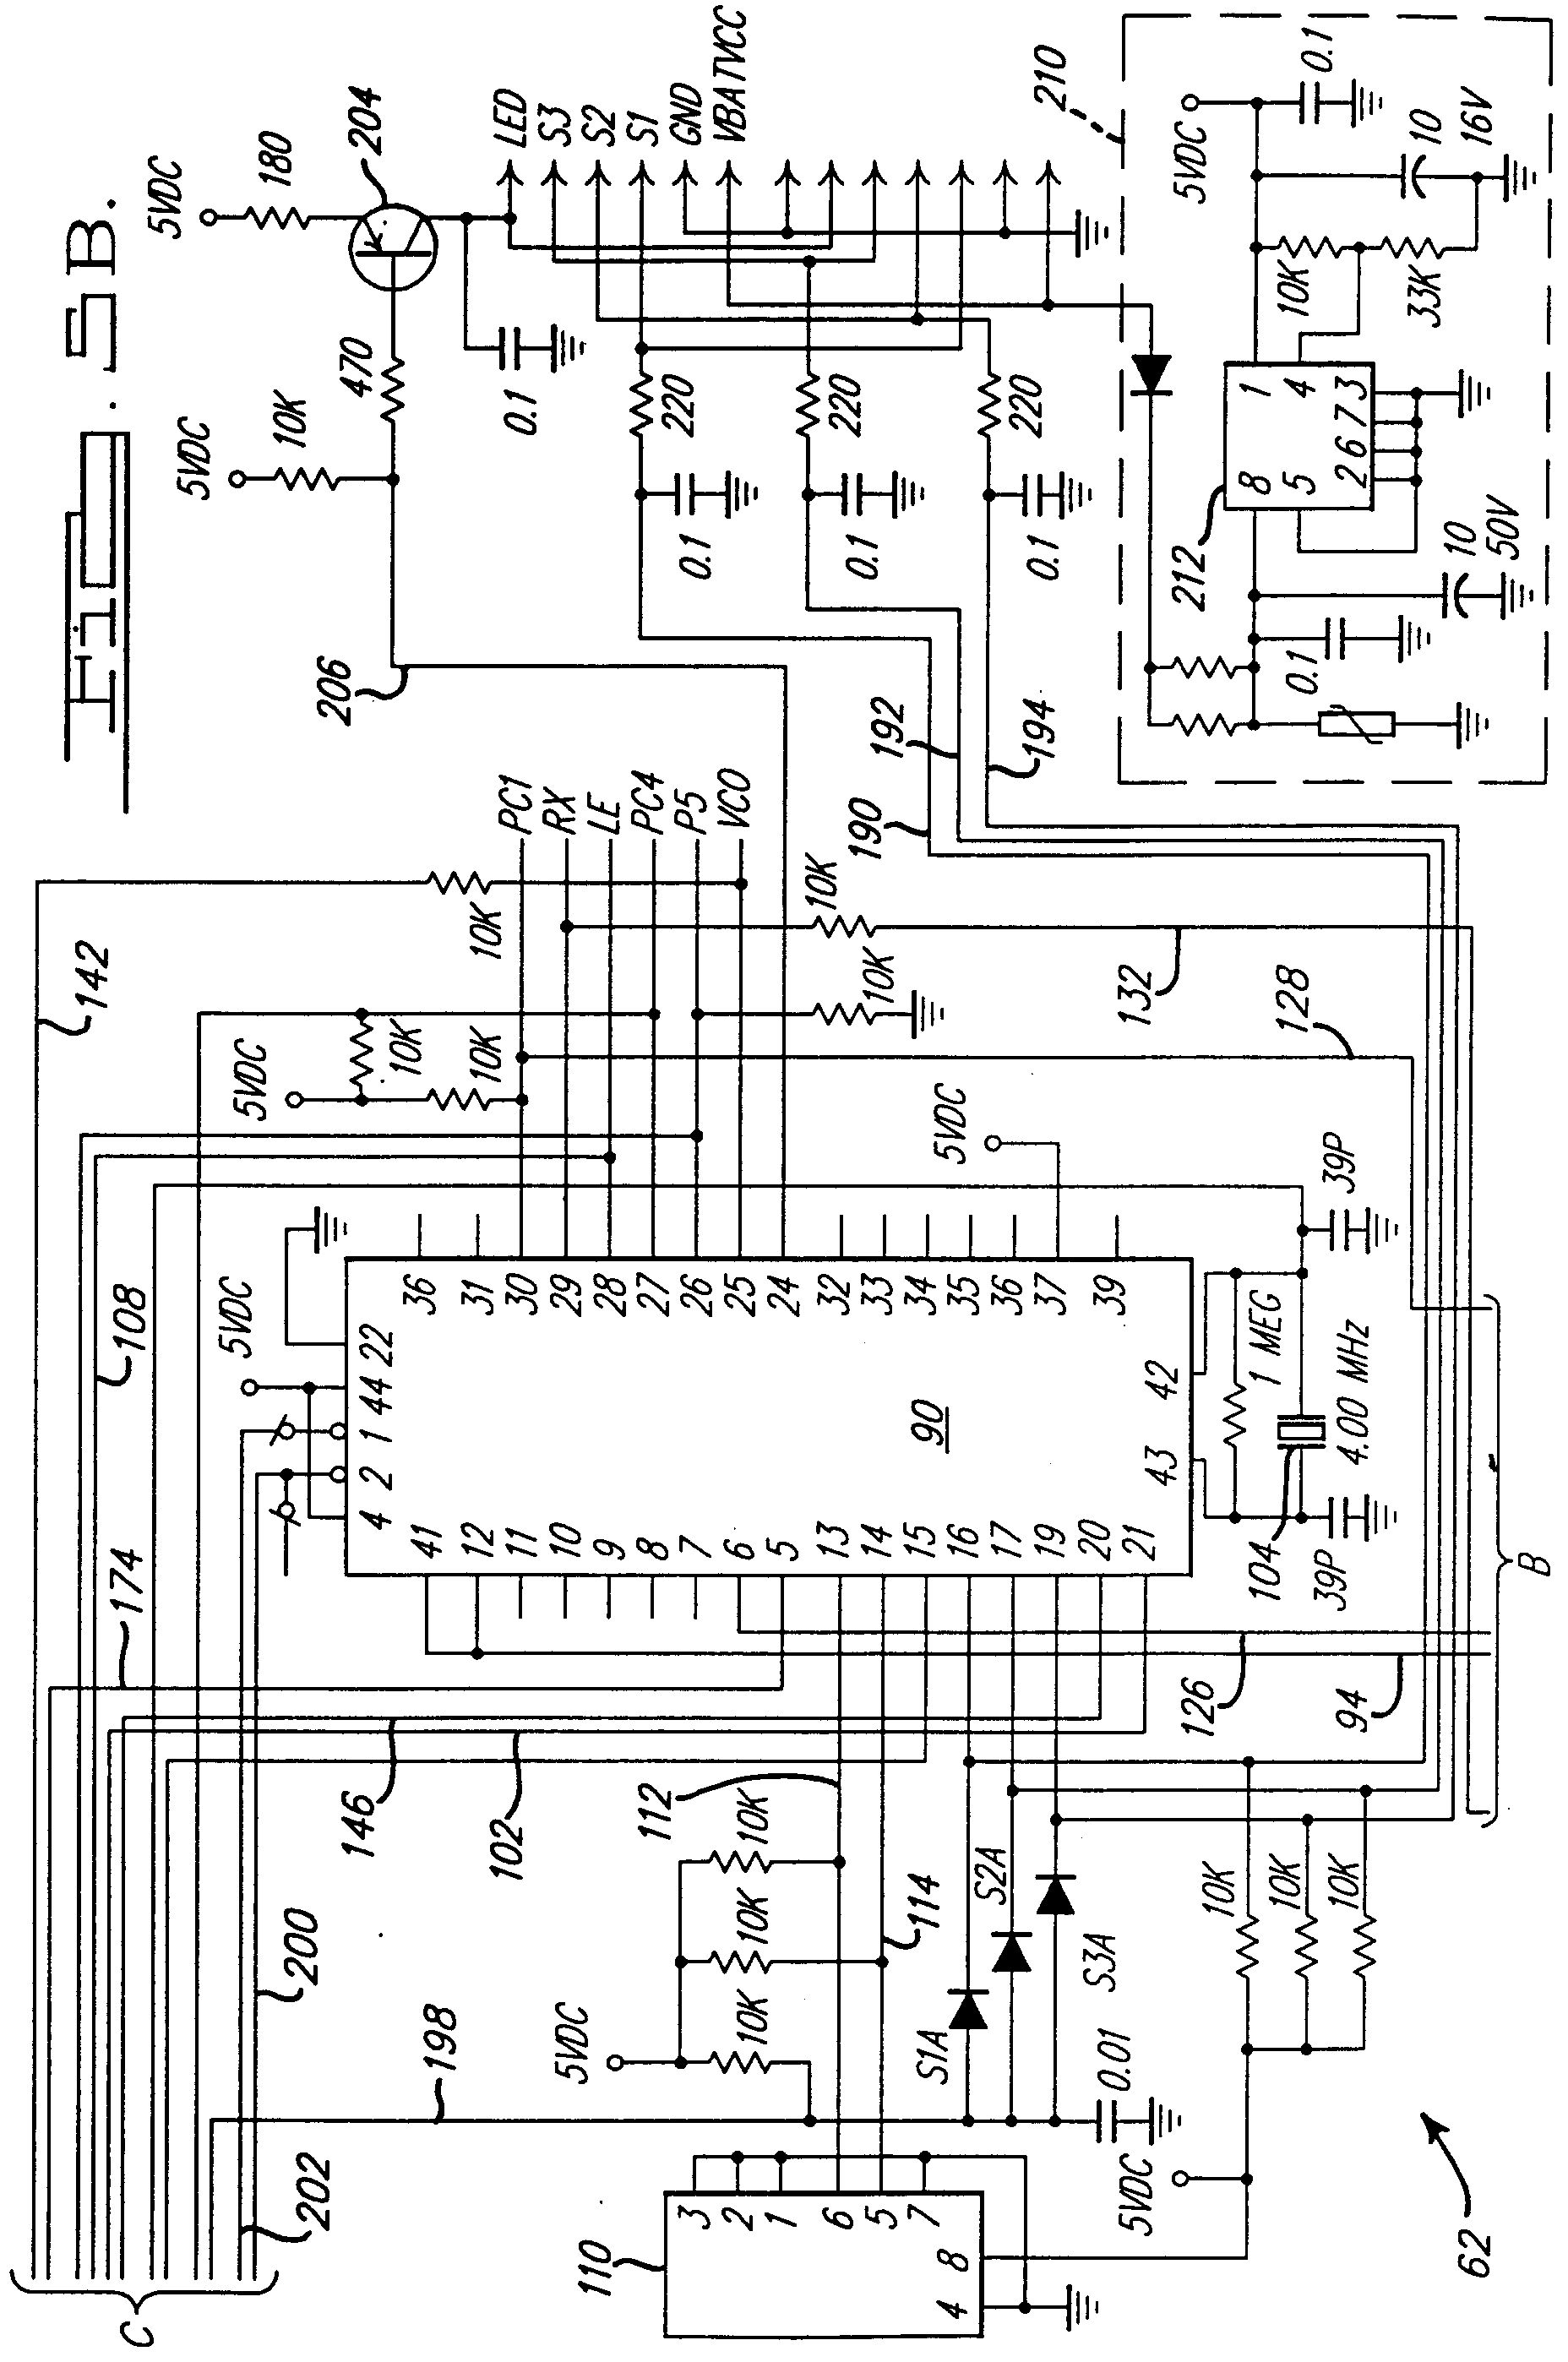 Genie Wiring Diagram - Data Wiring Diagram